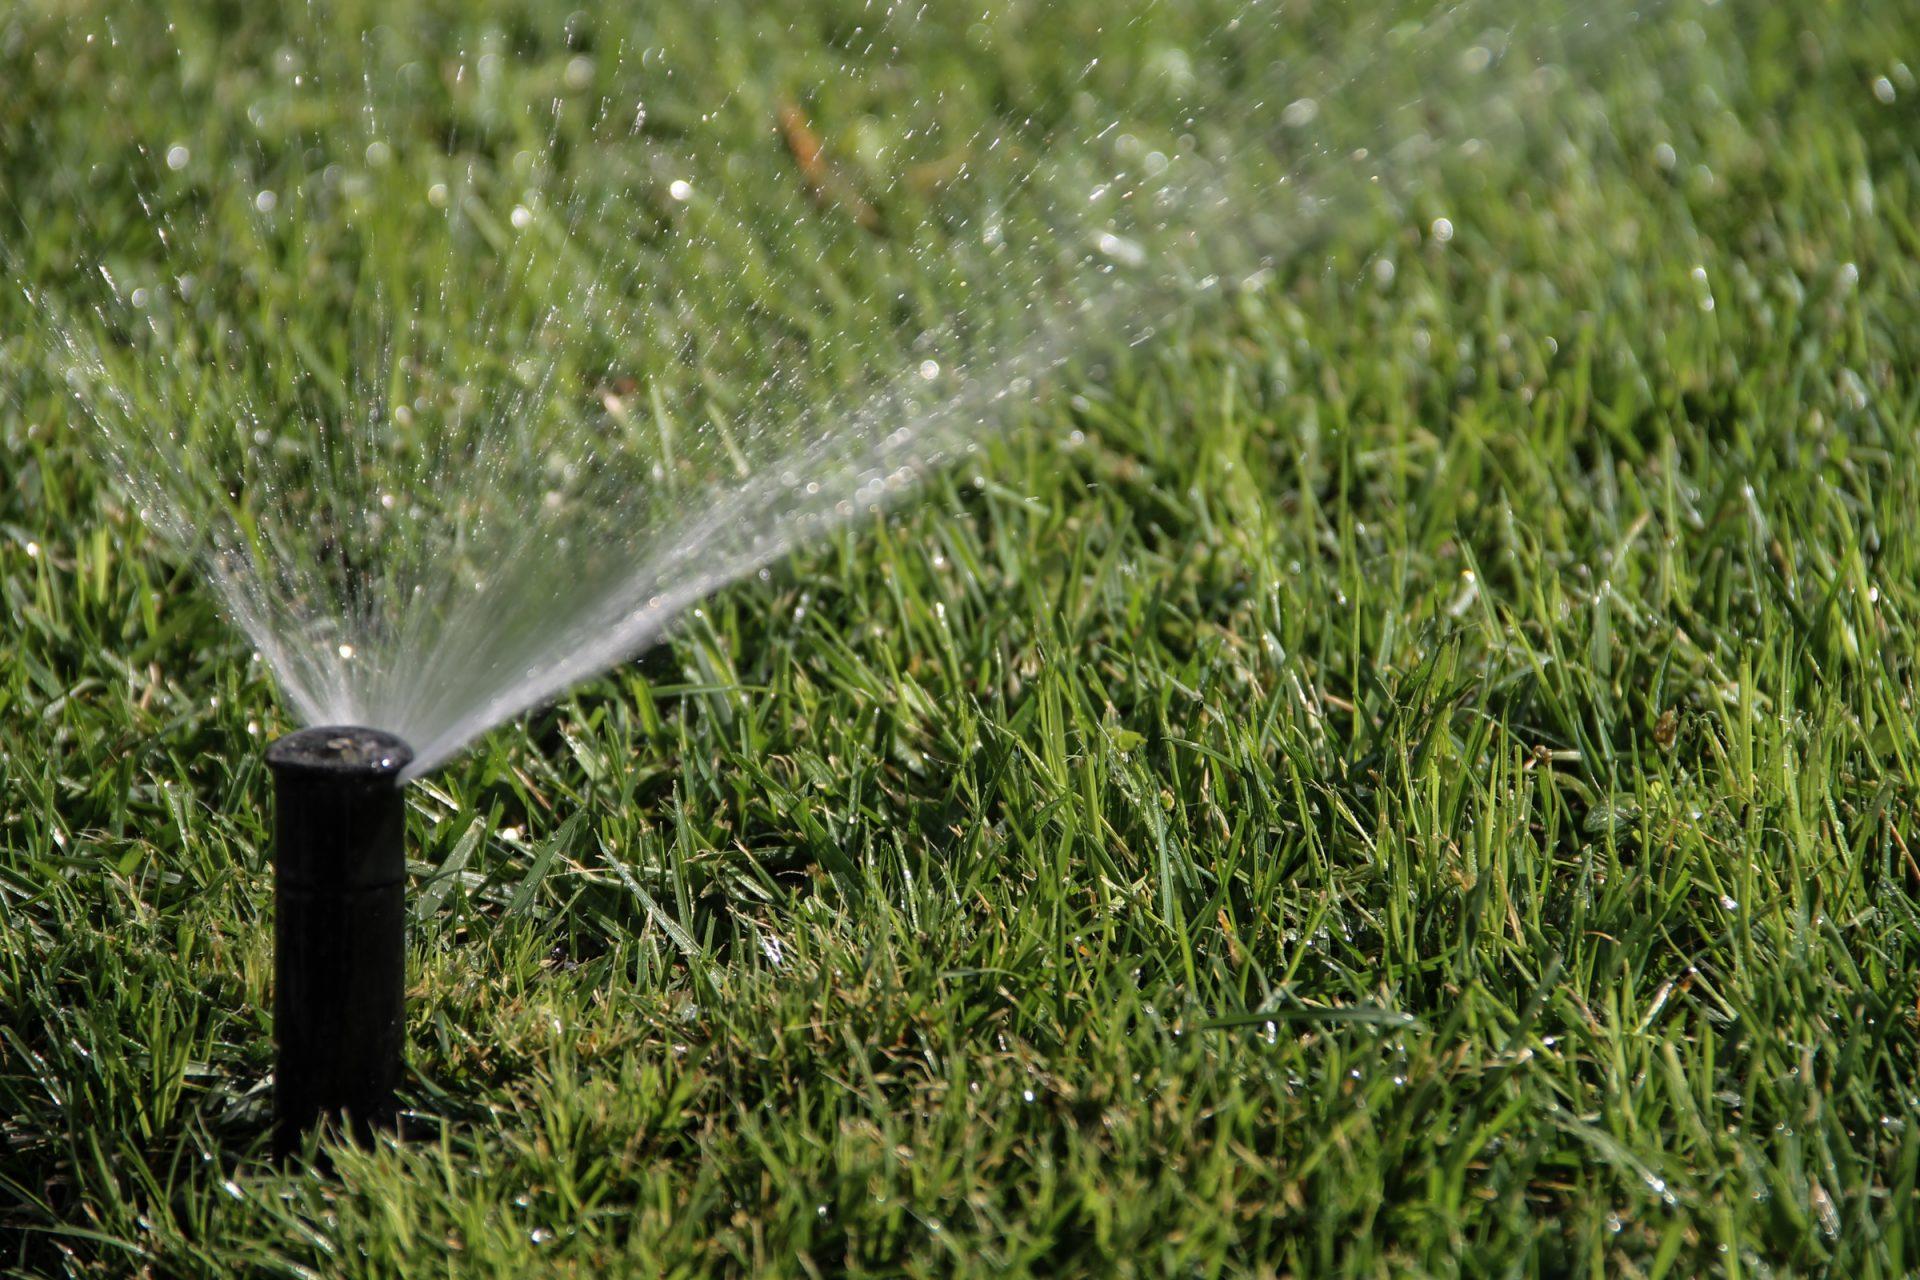 Sprinkler Watering Green Grass